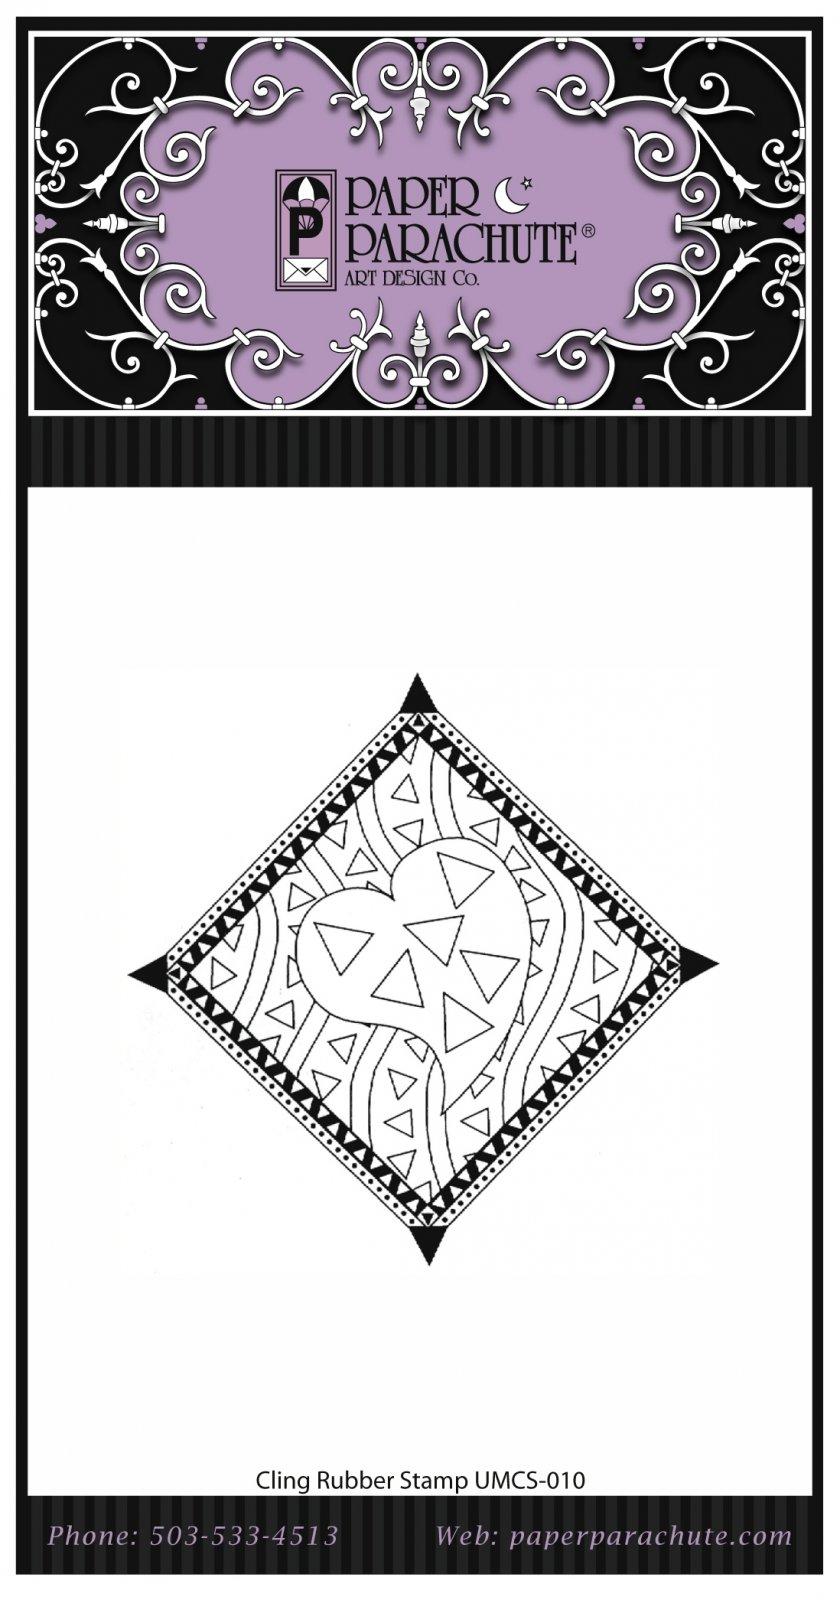 Paper Parachute Rubber Stamp -UMCS10